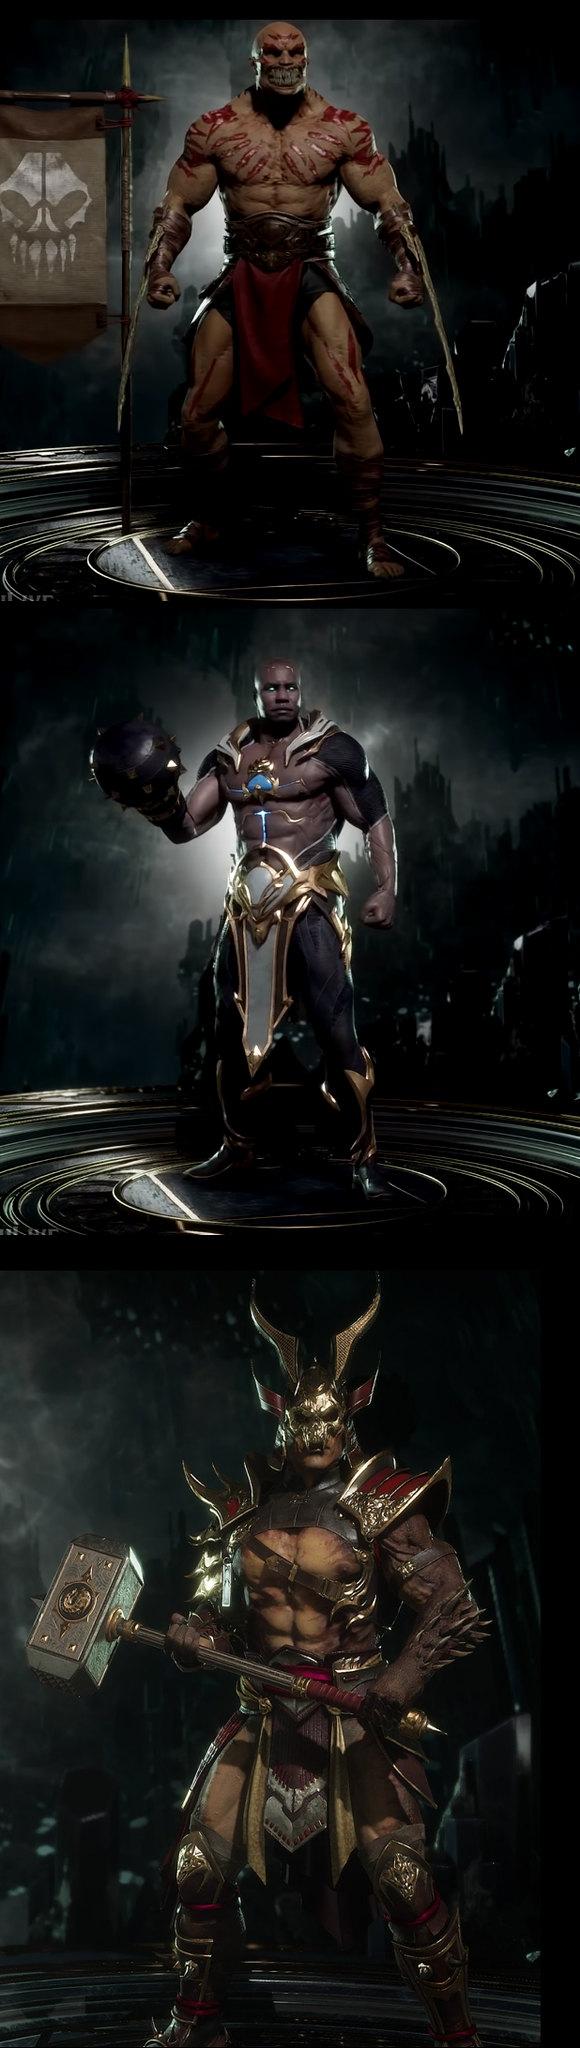 Mortal Kombat 11 - Buff Sexy Mannetjes